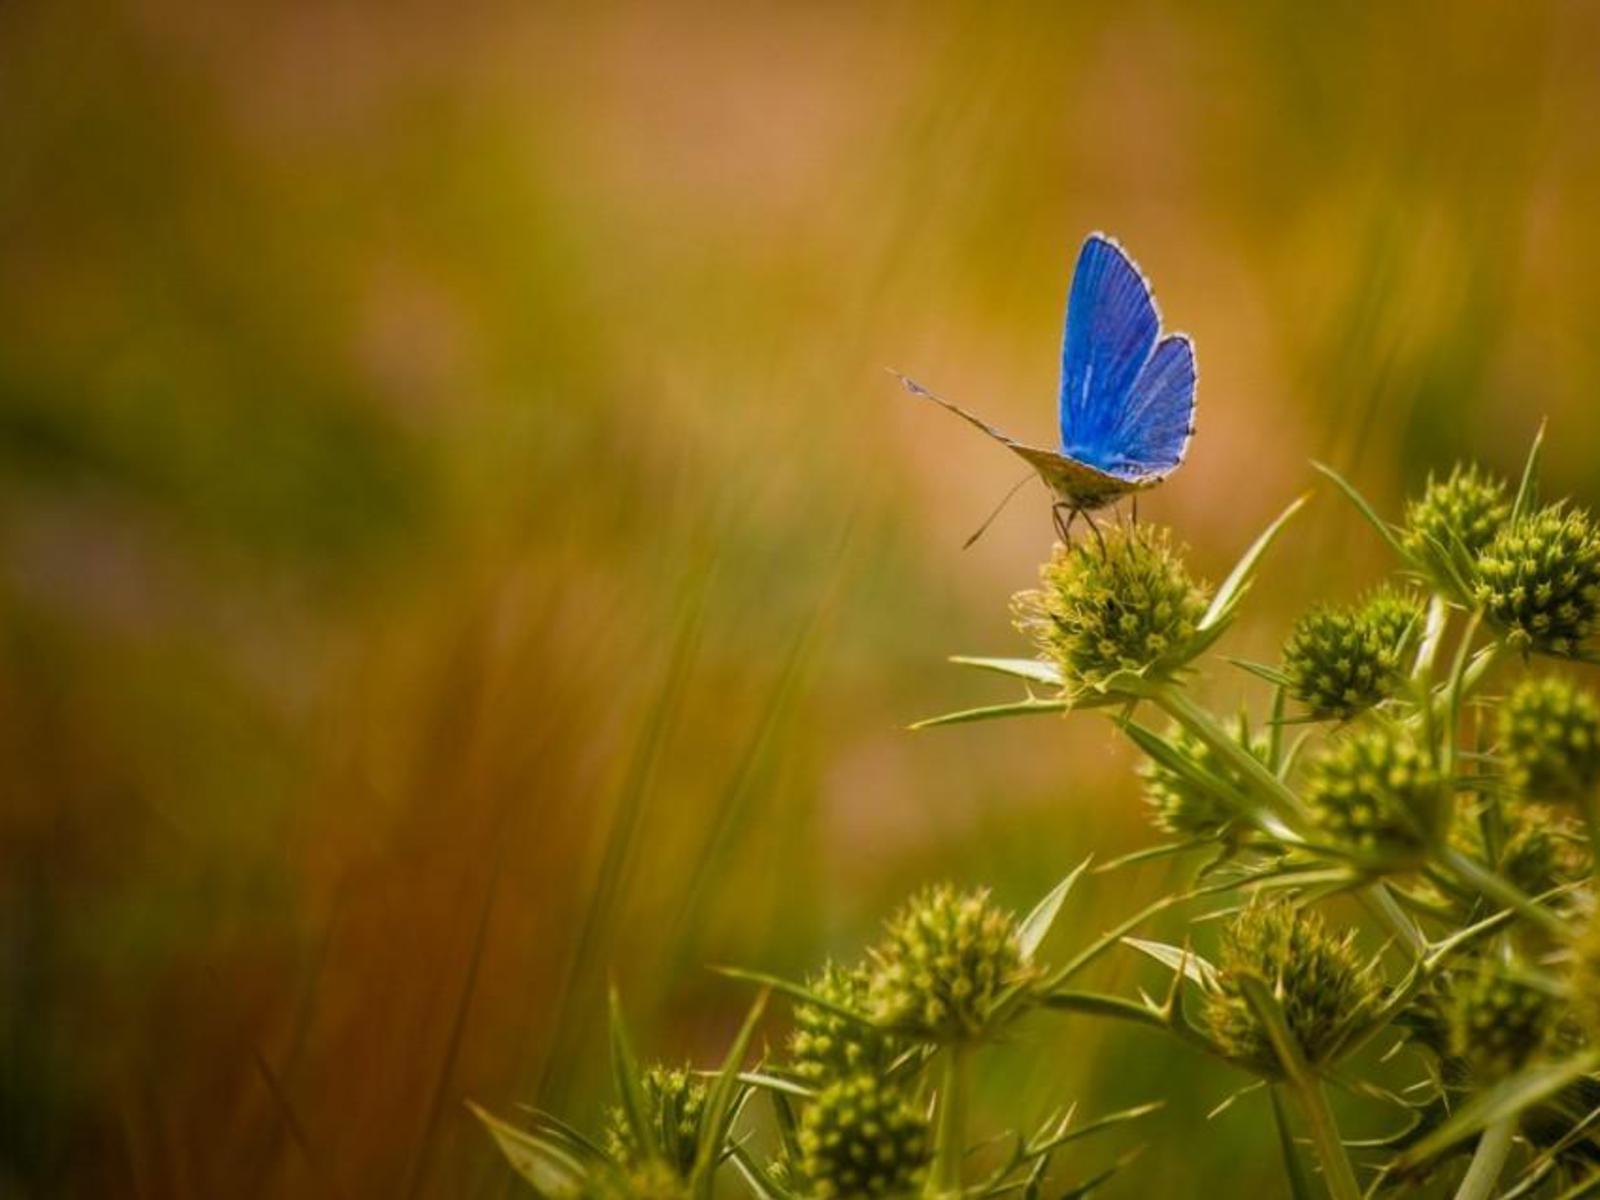 Beautiful Butterflies Wallpapers, Download Free Butterflies ...